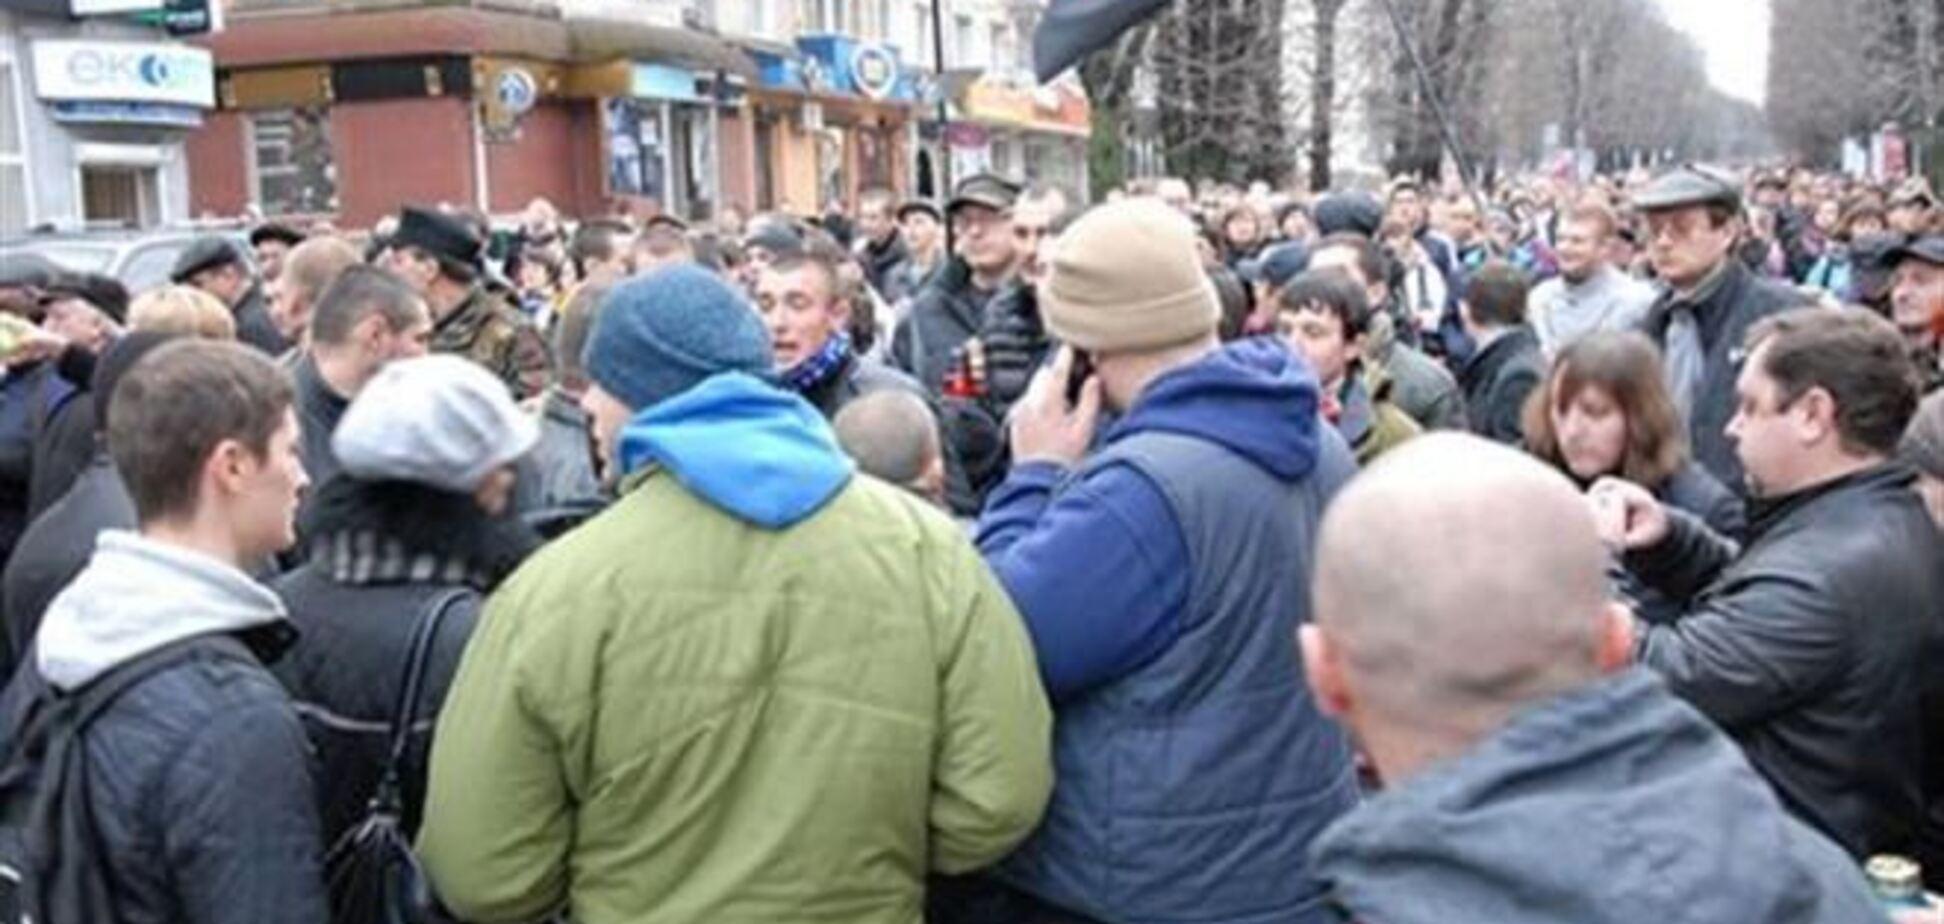 'Титушки' на 'Арсенальной' не пускают людей на Майдан